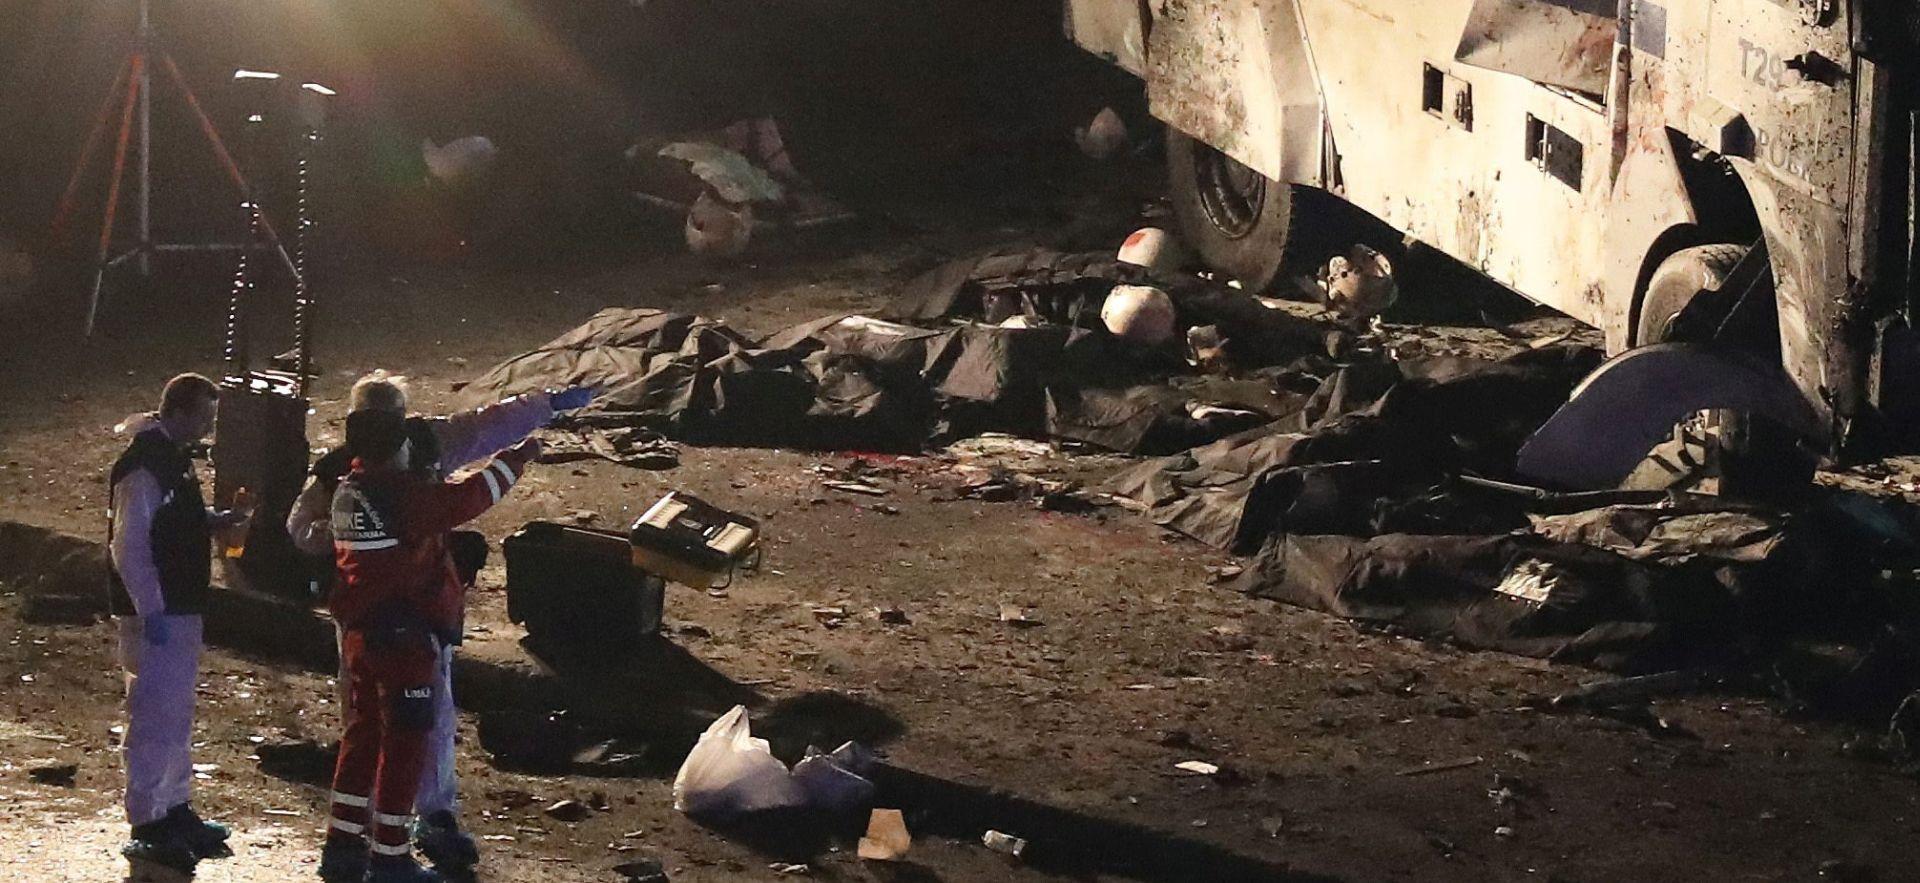 FOTO/VIDEO: ISTANBUL Dvije eksplozije ispred stadiona Bešiktaša, najmanje 13 mrtvih